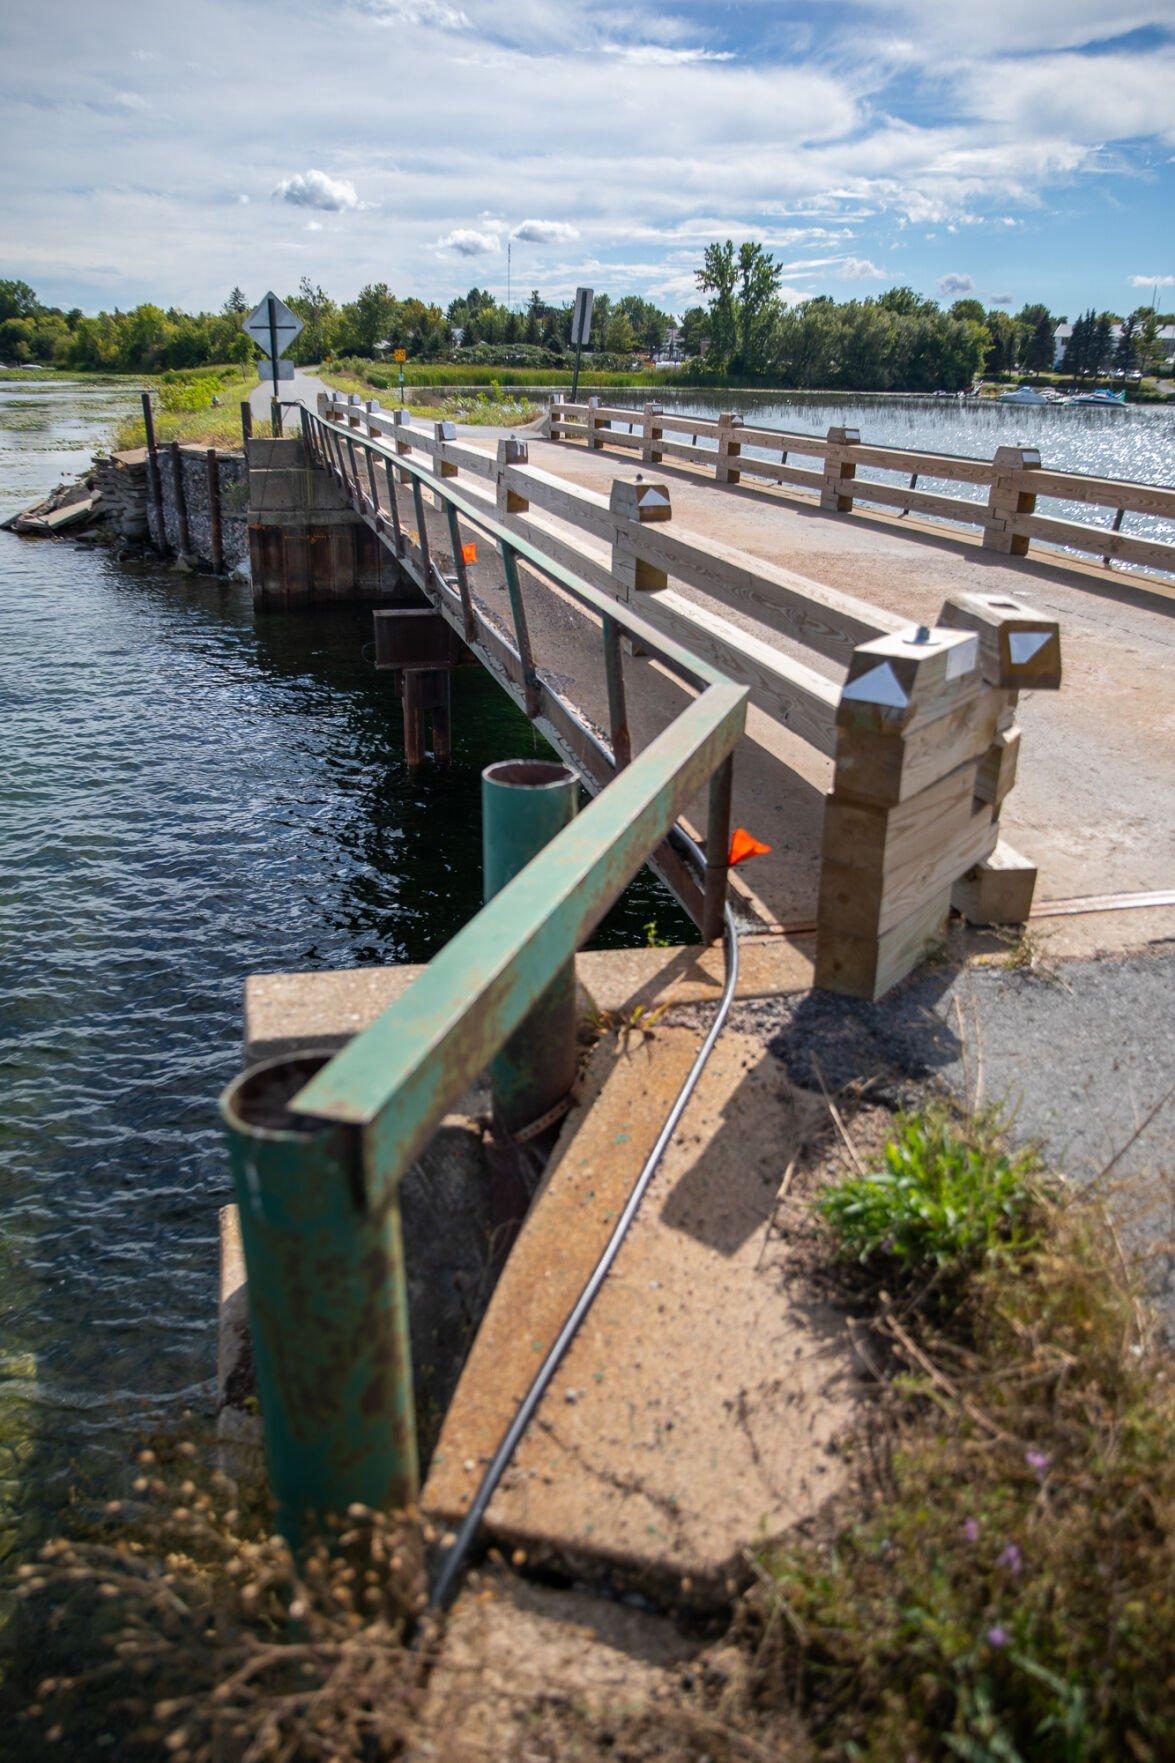 Bridge shows more structural concerns